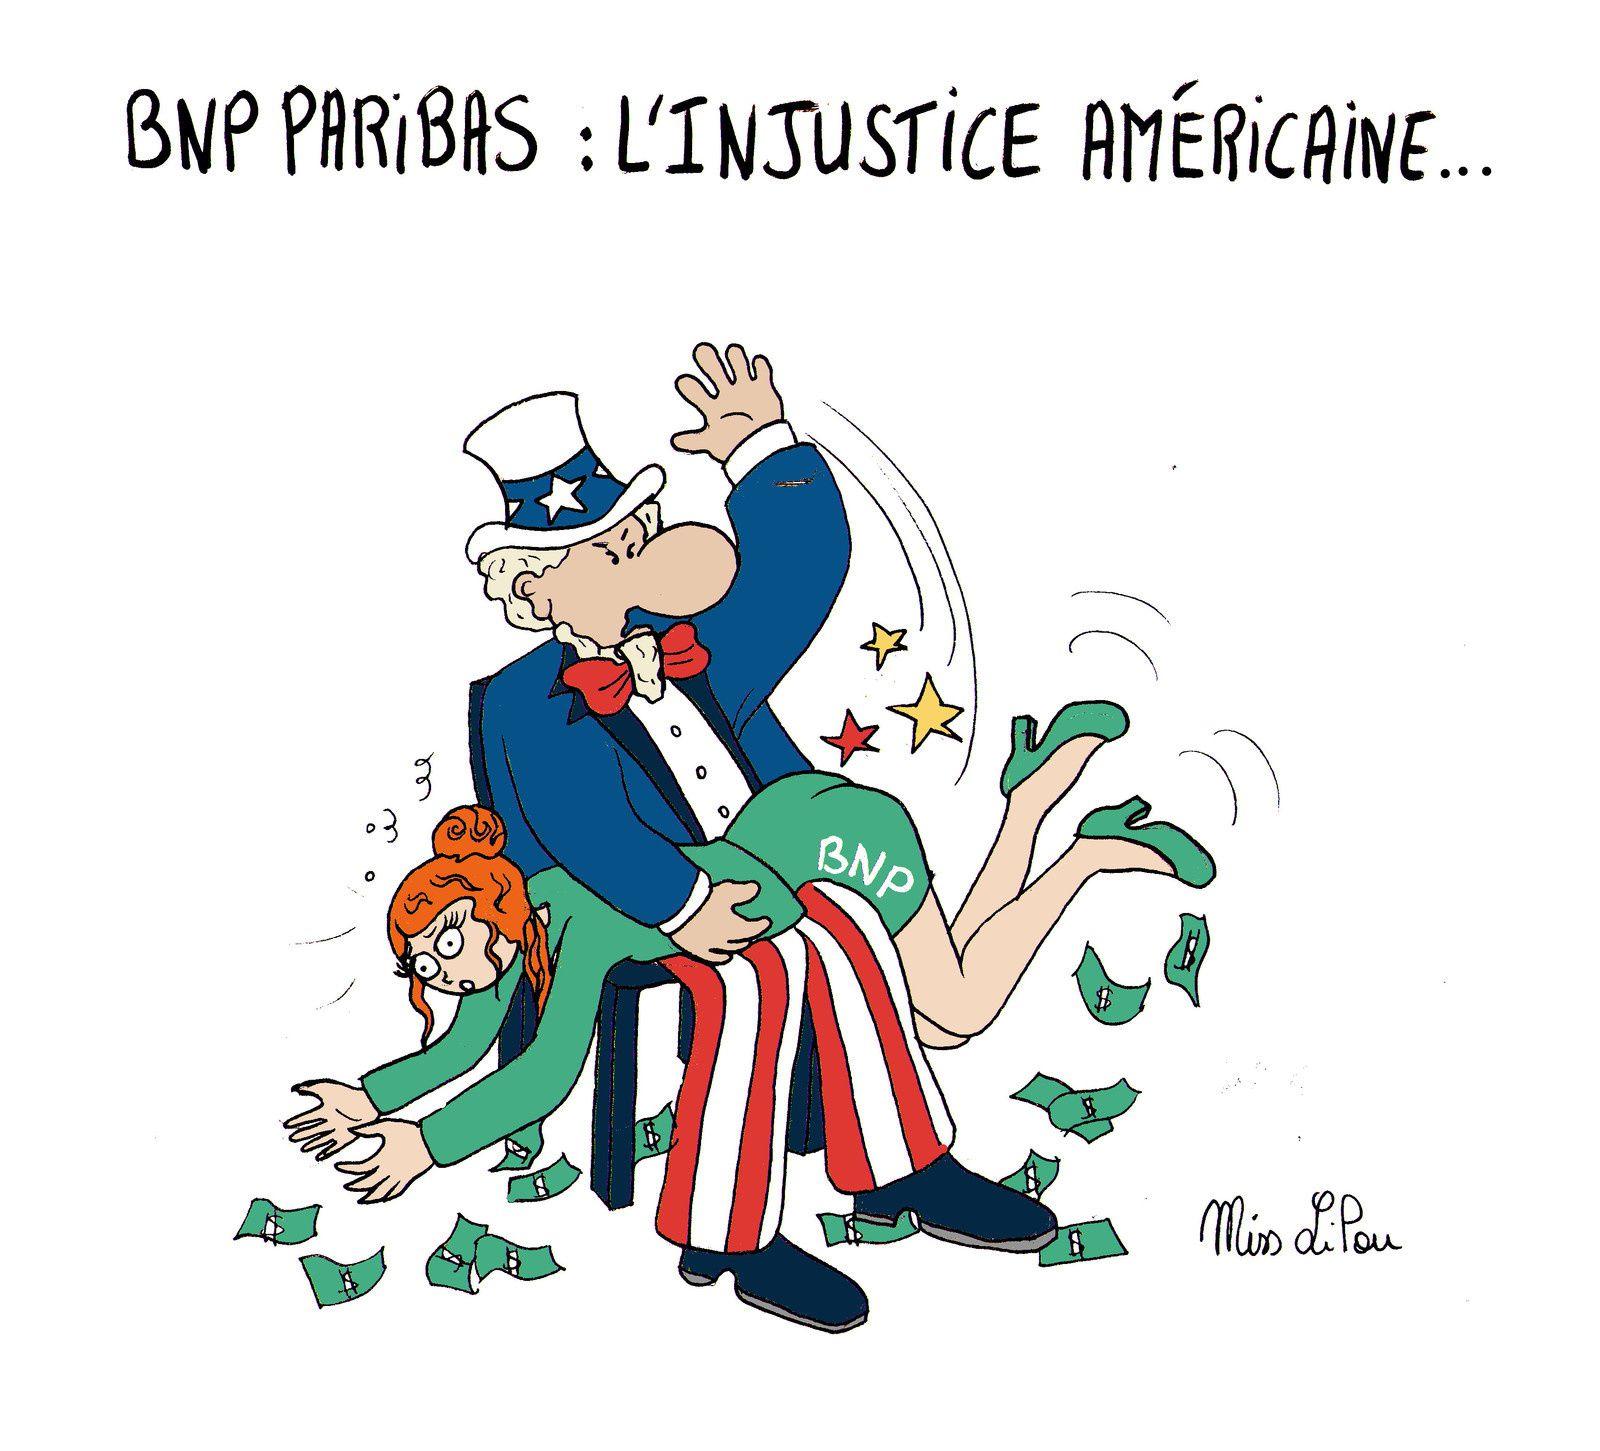 BNP PARIBAS : l'injustice américaine...